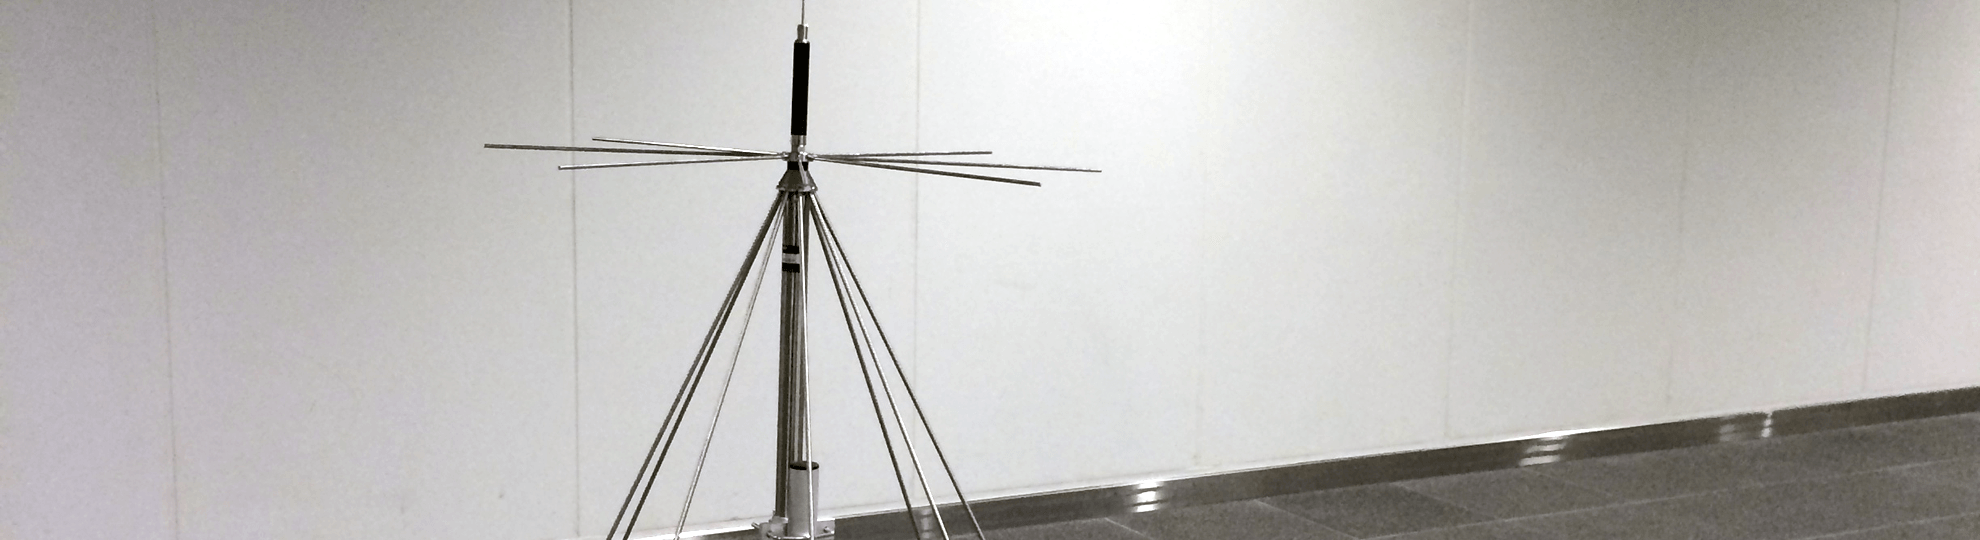 image_antenna_01